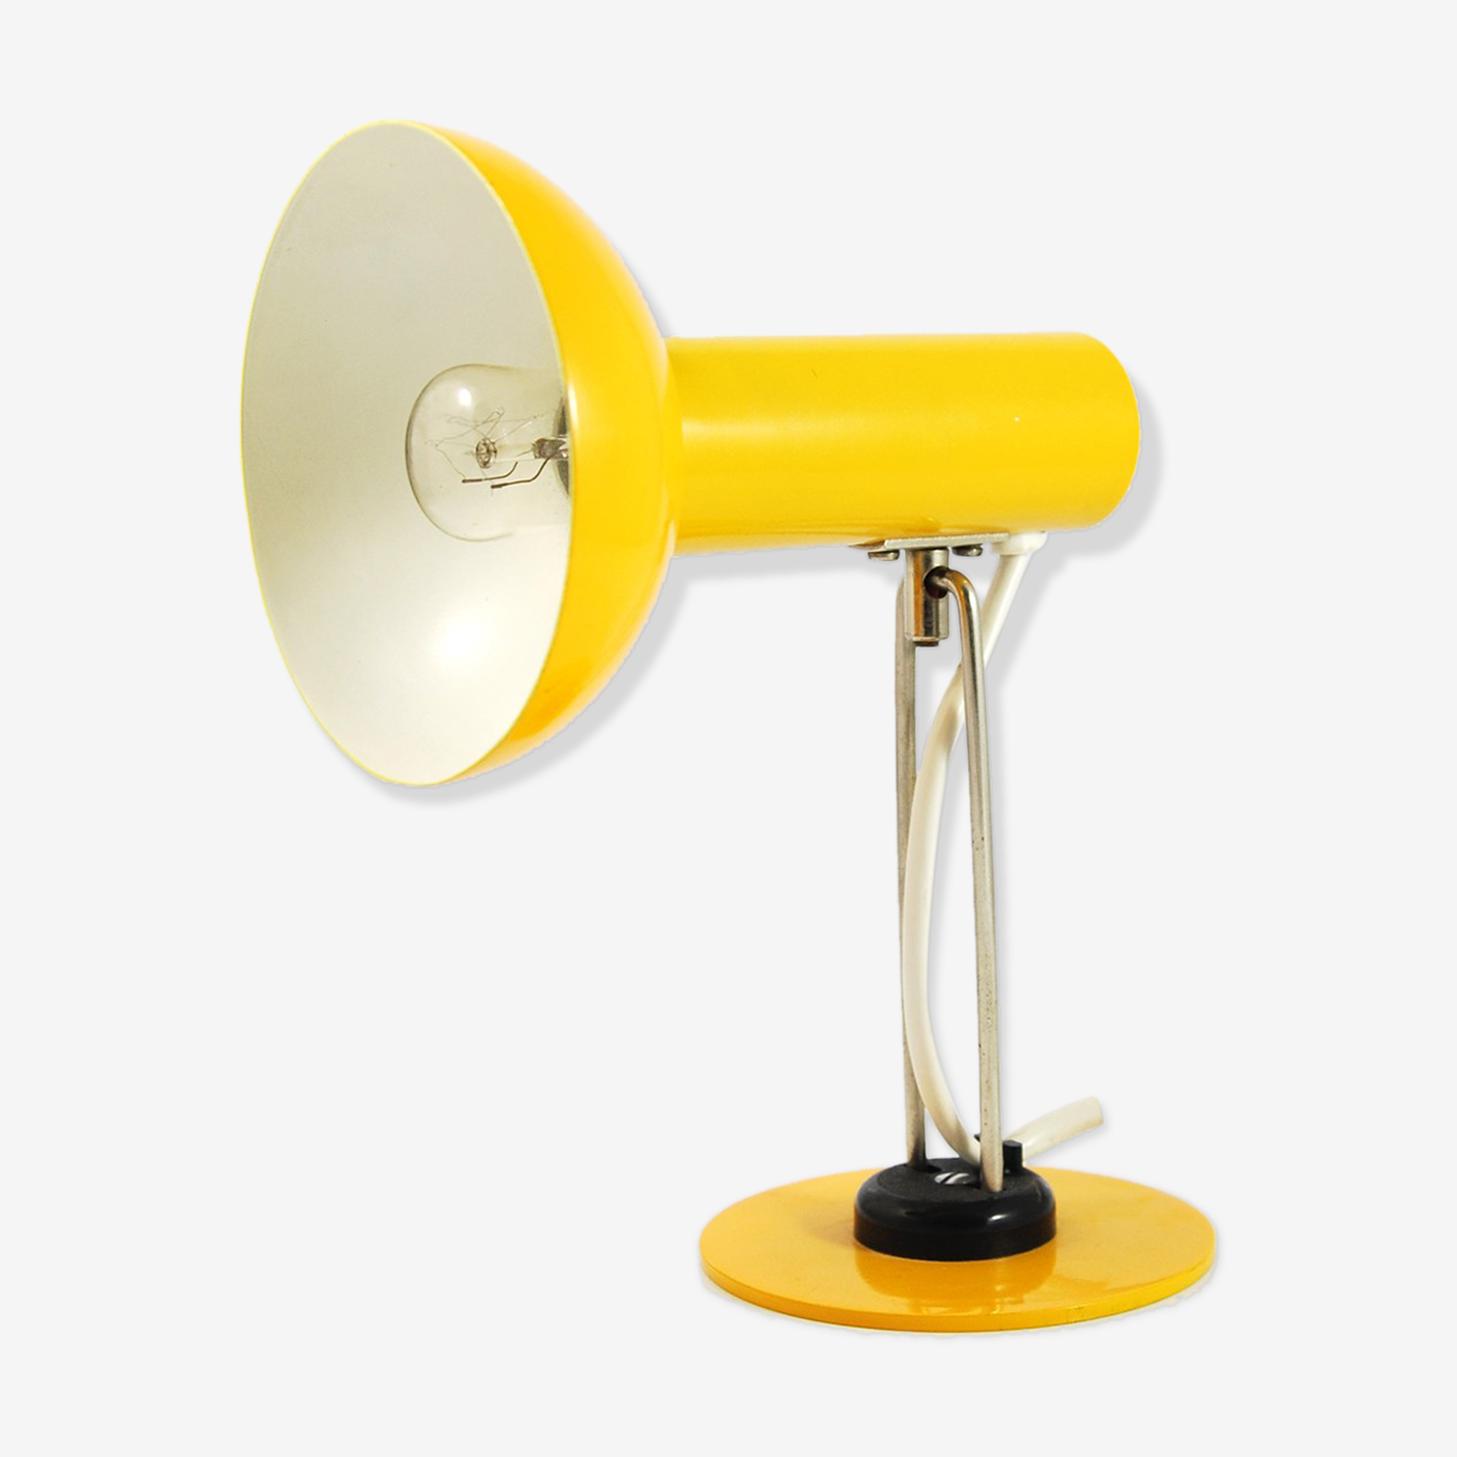 Lampe De Bureau Jaune Aka 3653 Allemagne Des Annees 70 Metal